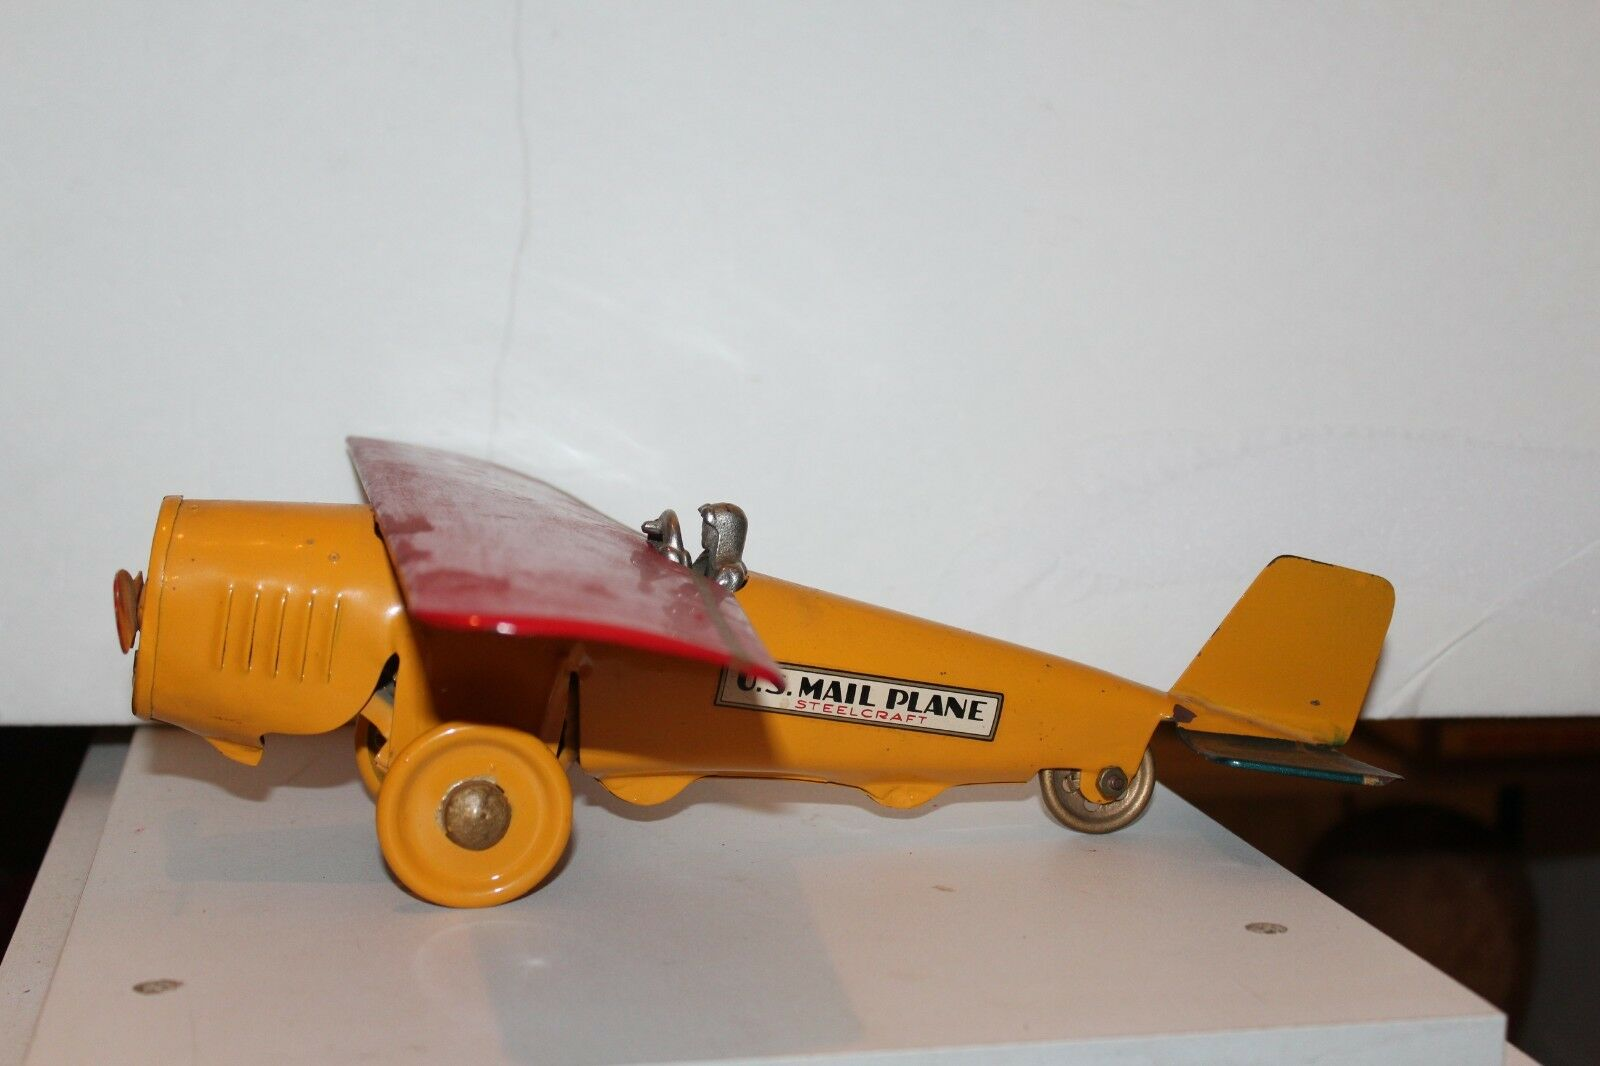 VERY NICE VINTAGE 1920'S DAYTON HILL CLIMBER PRESSED STEEL U.S. MAIL AIRPLANE